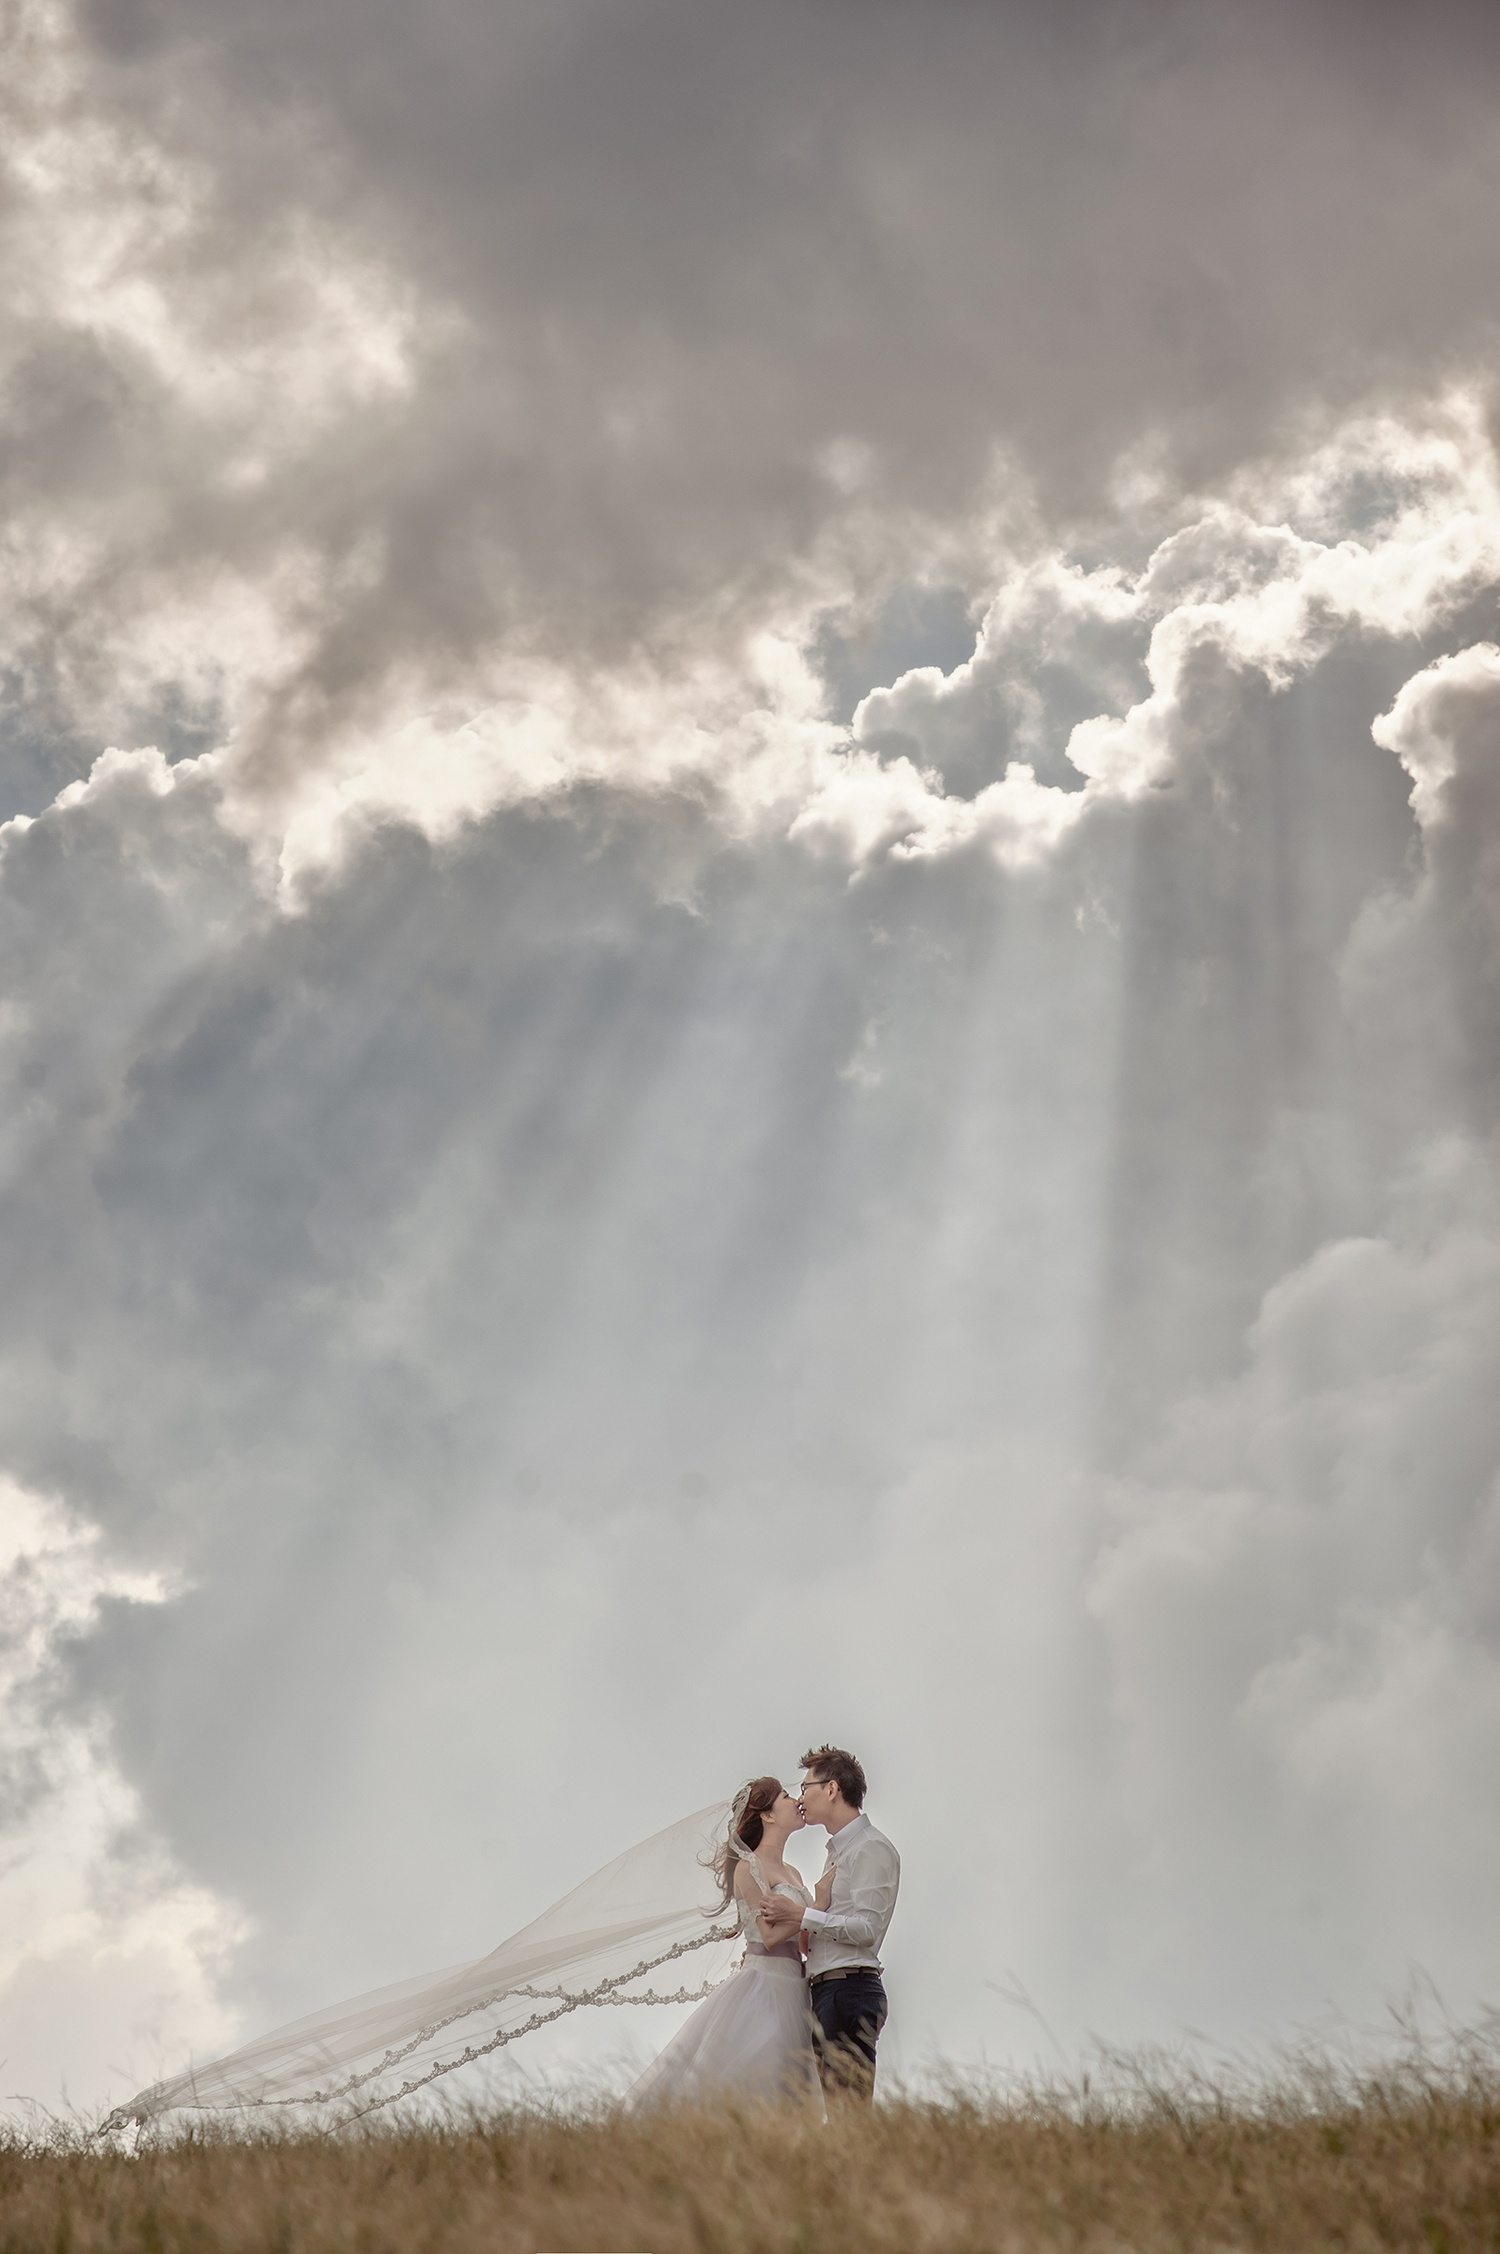 11550868036_8f8e55bb7e_o-法鬥影像工作室_婚攝, 婚禮攝影, 婚禮紀錄, 婚紗攝影, 自助婚紗, 婚攝推薦, 攝影棚出租, 攝影棚租借, 孕婦禮服出租, 孕婦禮服租借, CEO專業形象照, 形像照, 型像照, 型象照. 形象照團拍, 全家福, 全家福團拍, 招團, 揪團拍, 親子寫真, 家庭寫真, 抓周, 抓周團拍